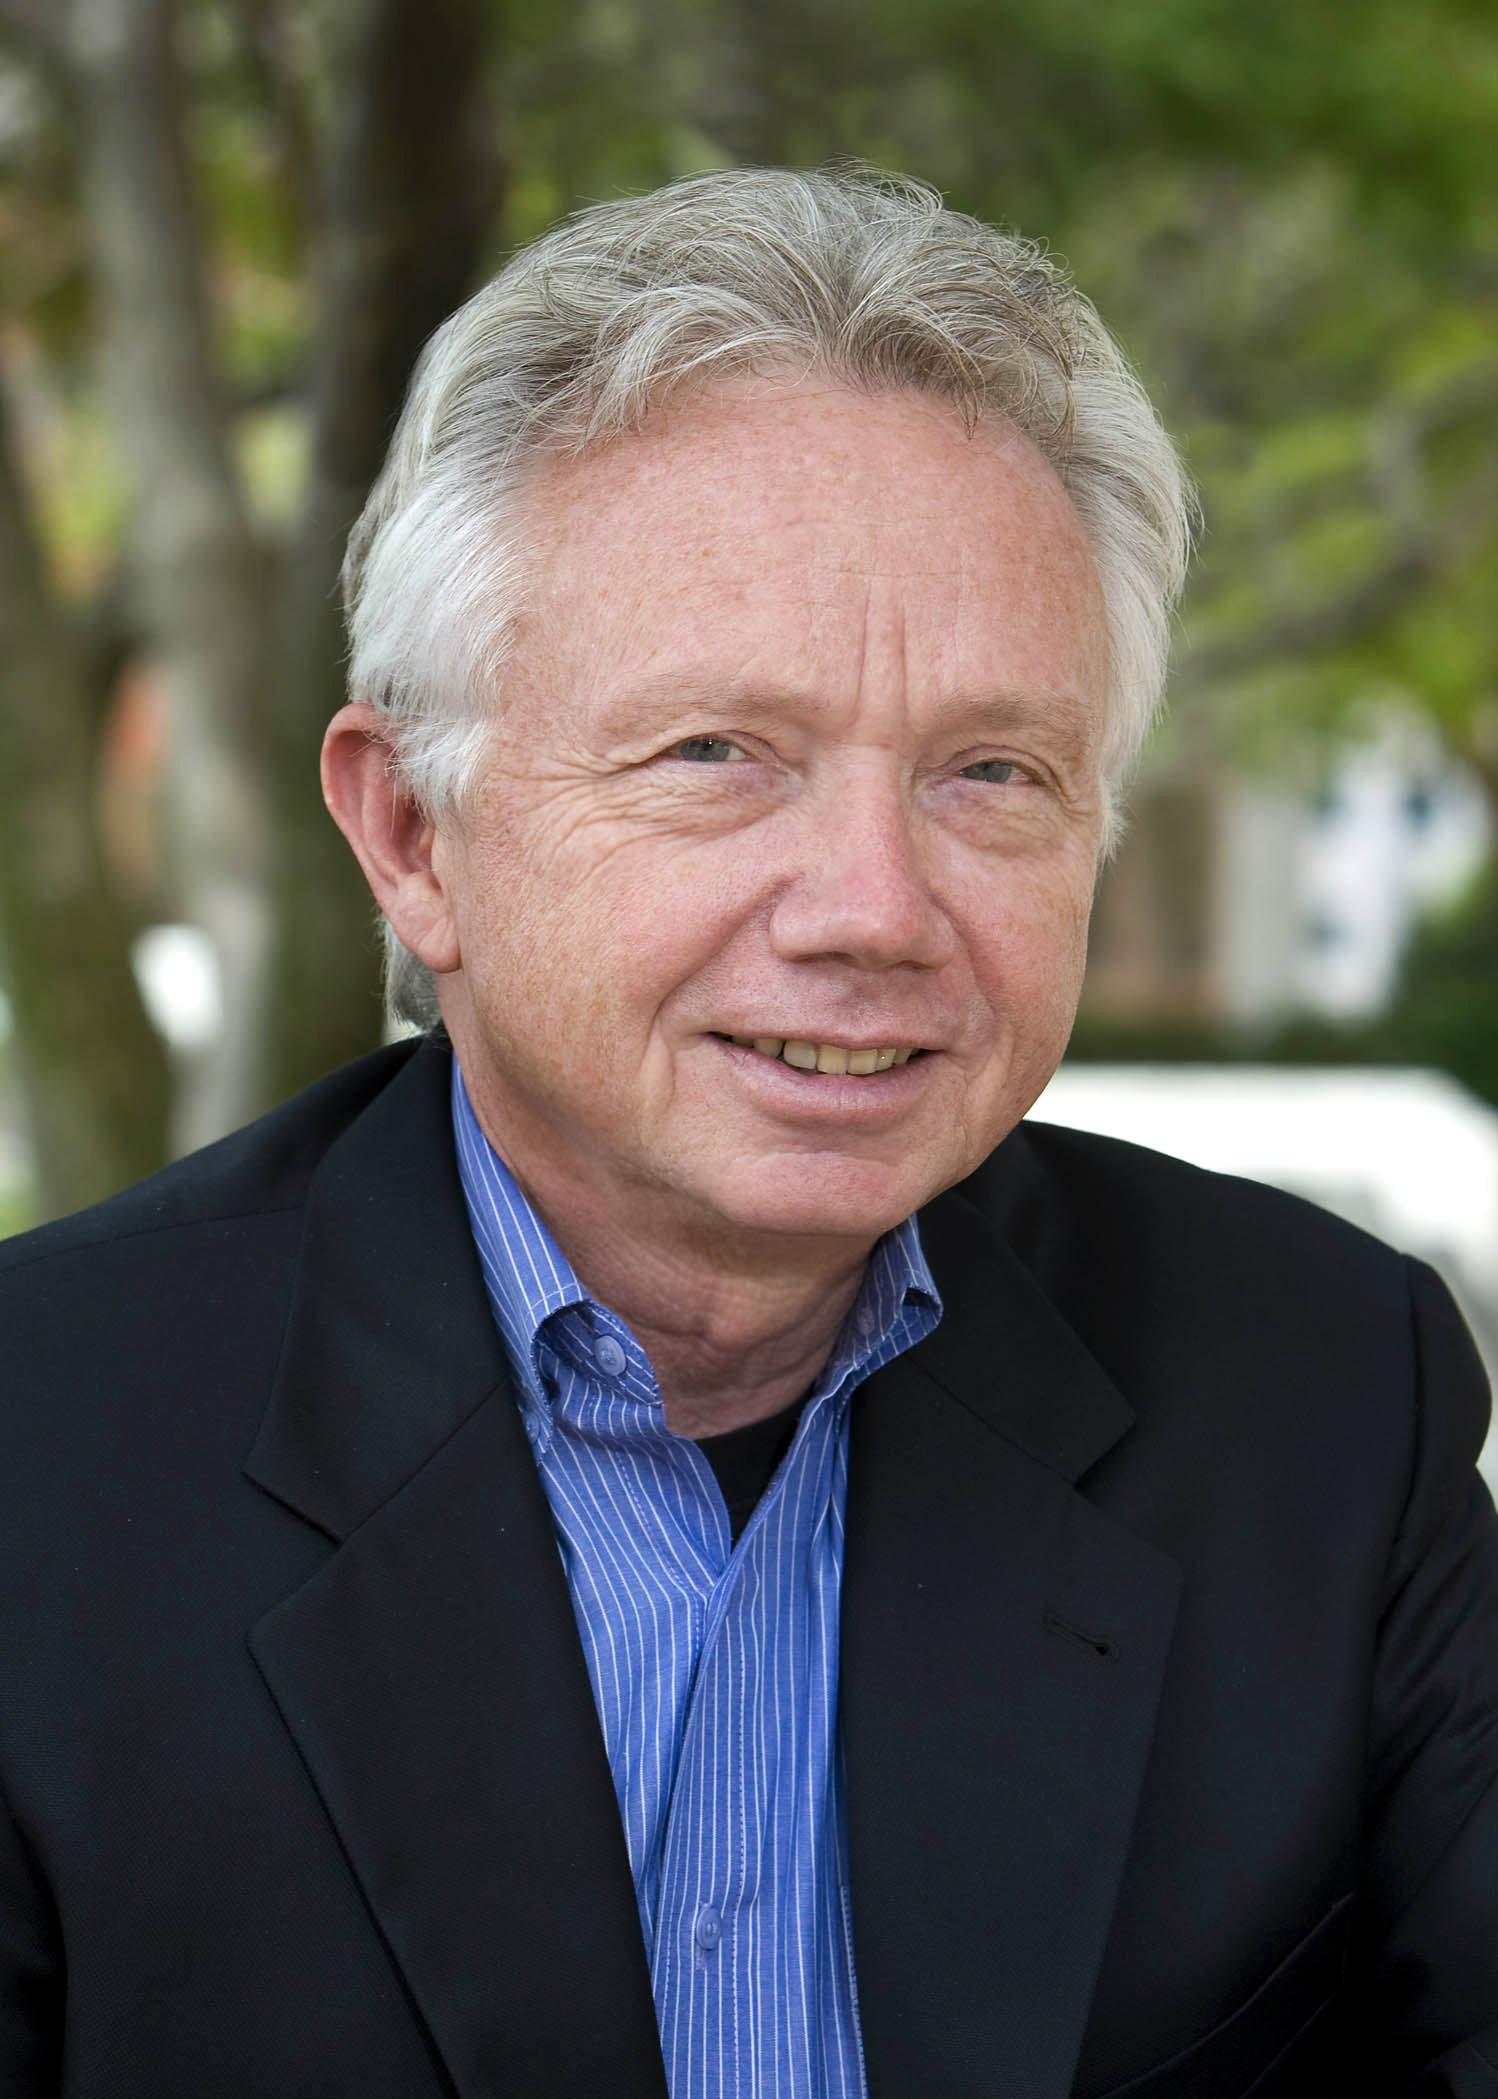 Richard J. Jackson